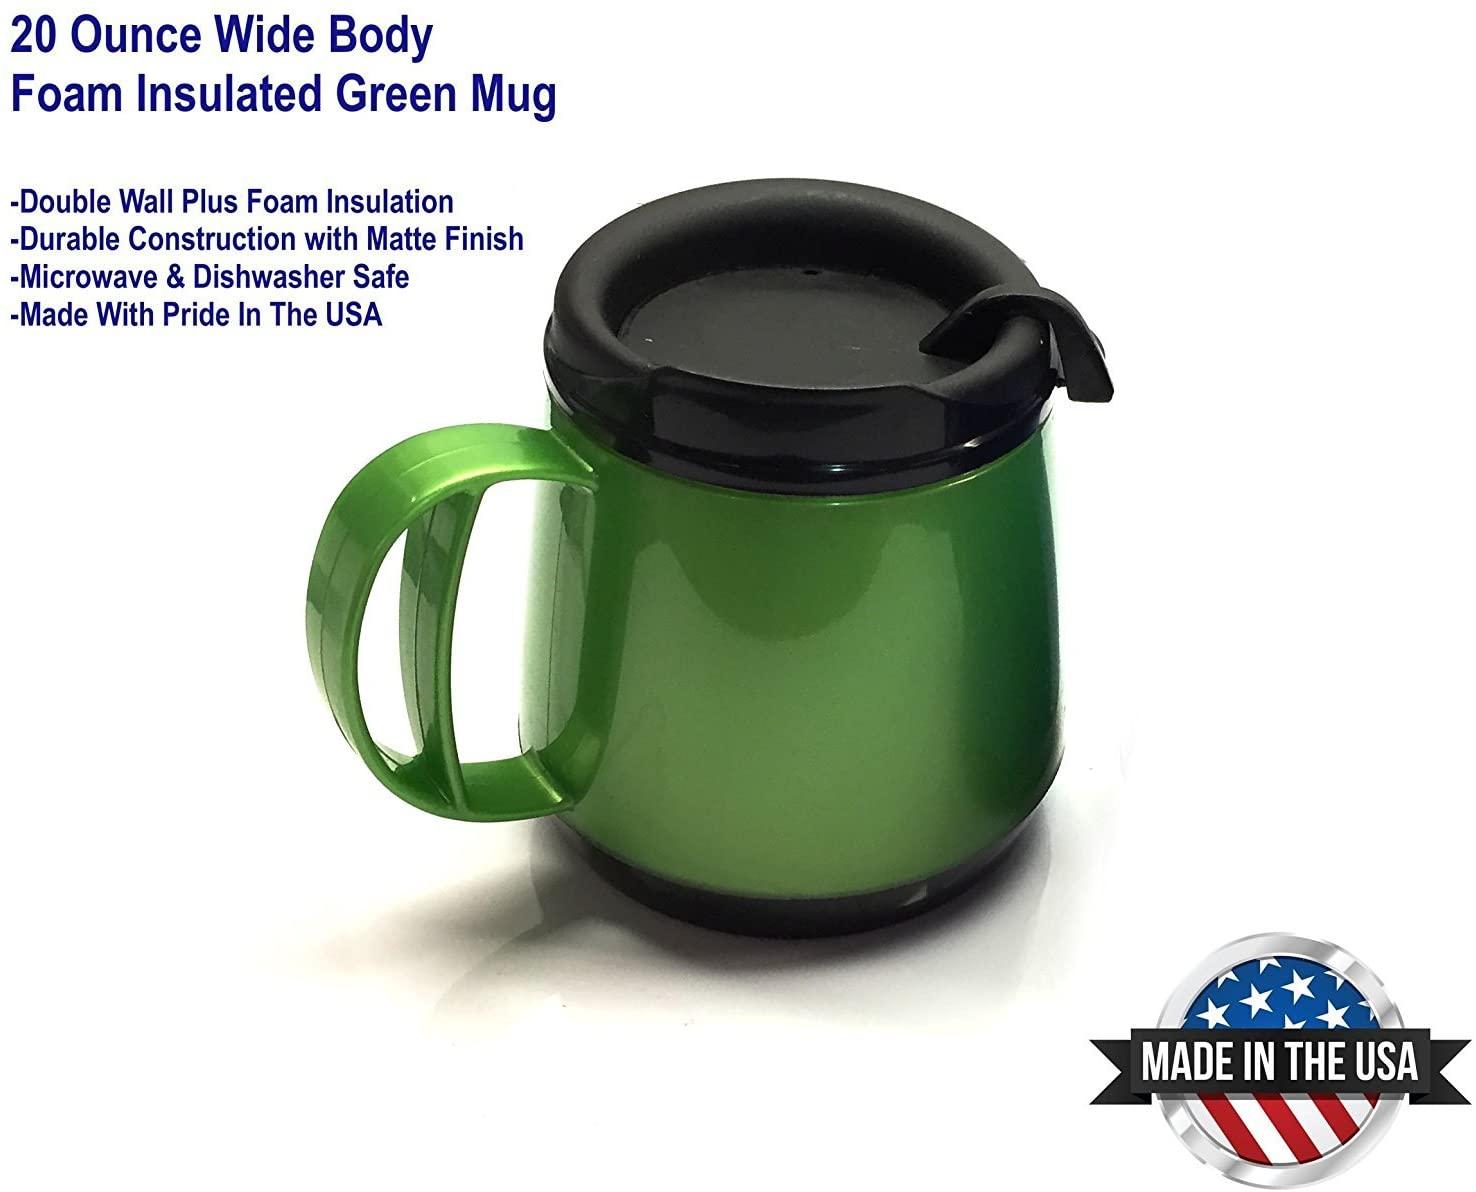 20oz. Foam Insulated Wide Body ThermoServ Mug- Green